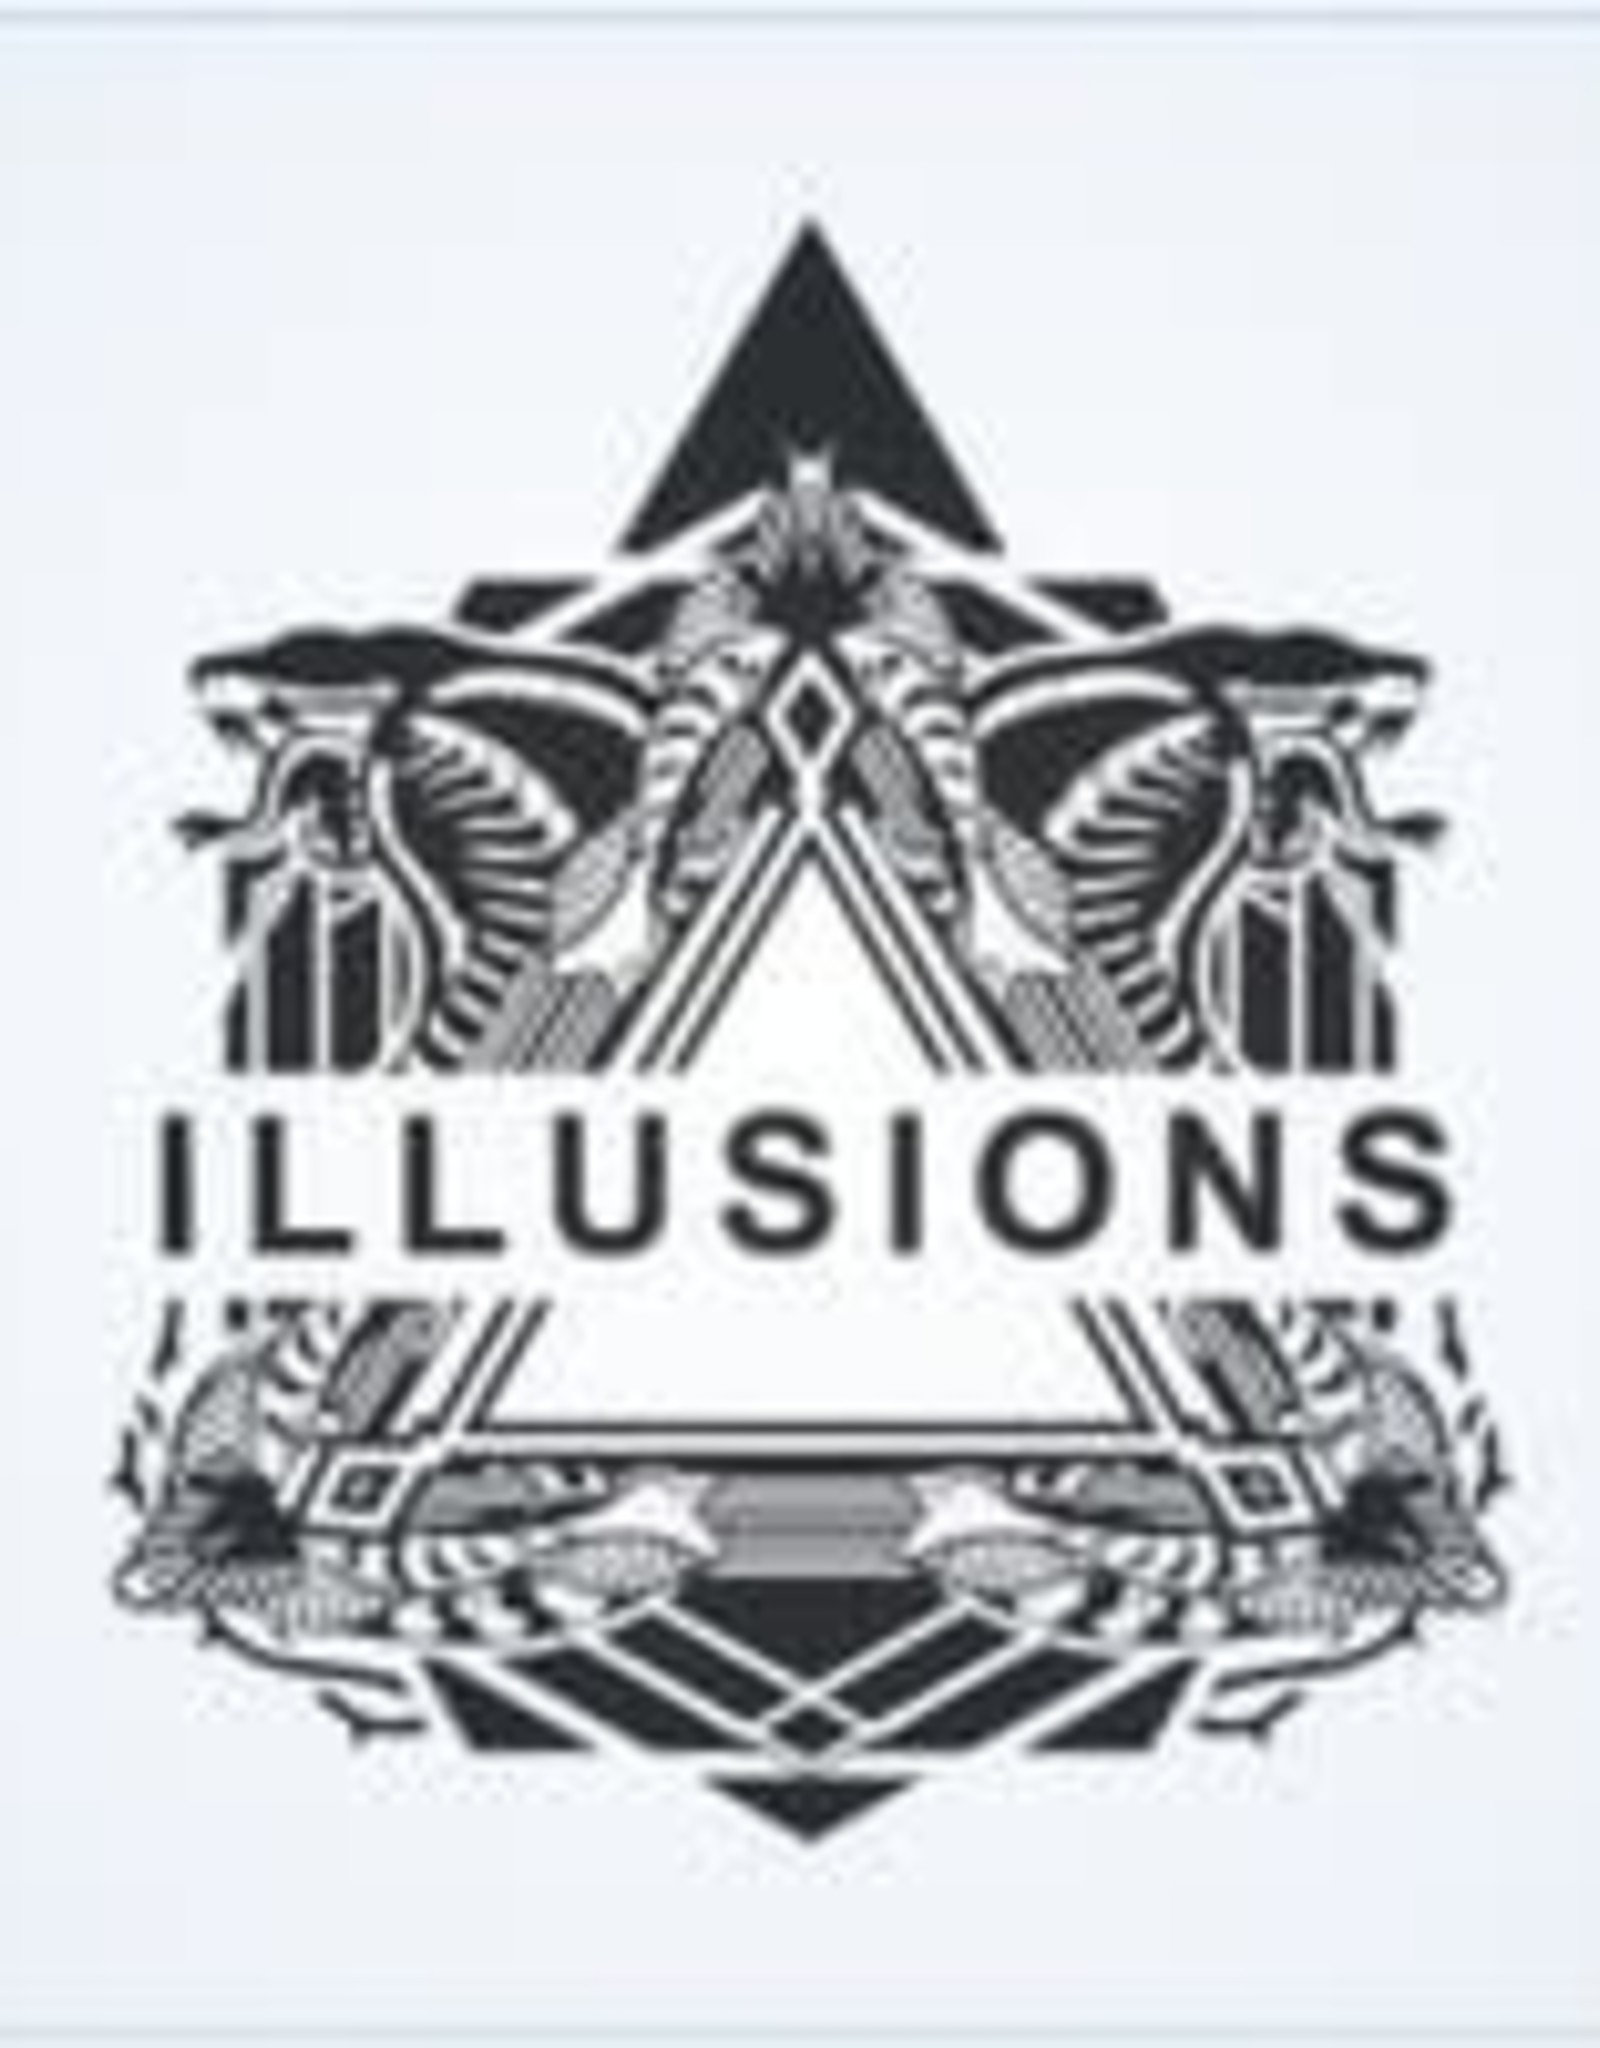 Illusions illusions HORIZON SERIES SALT